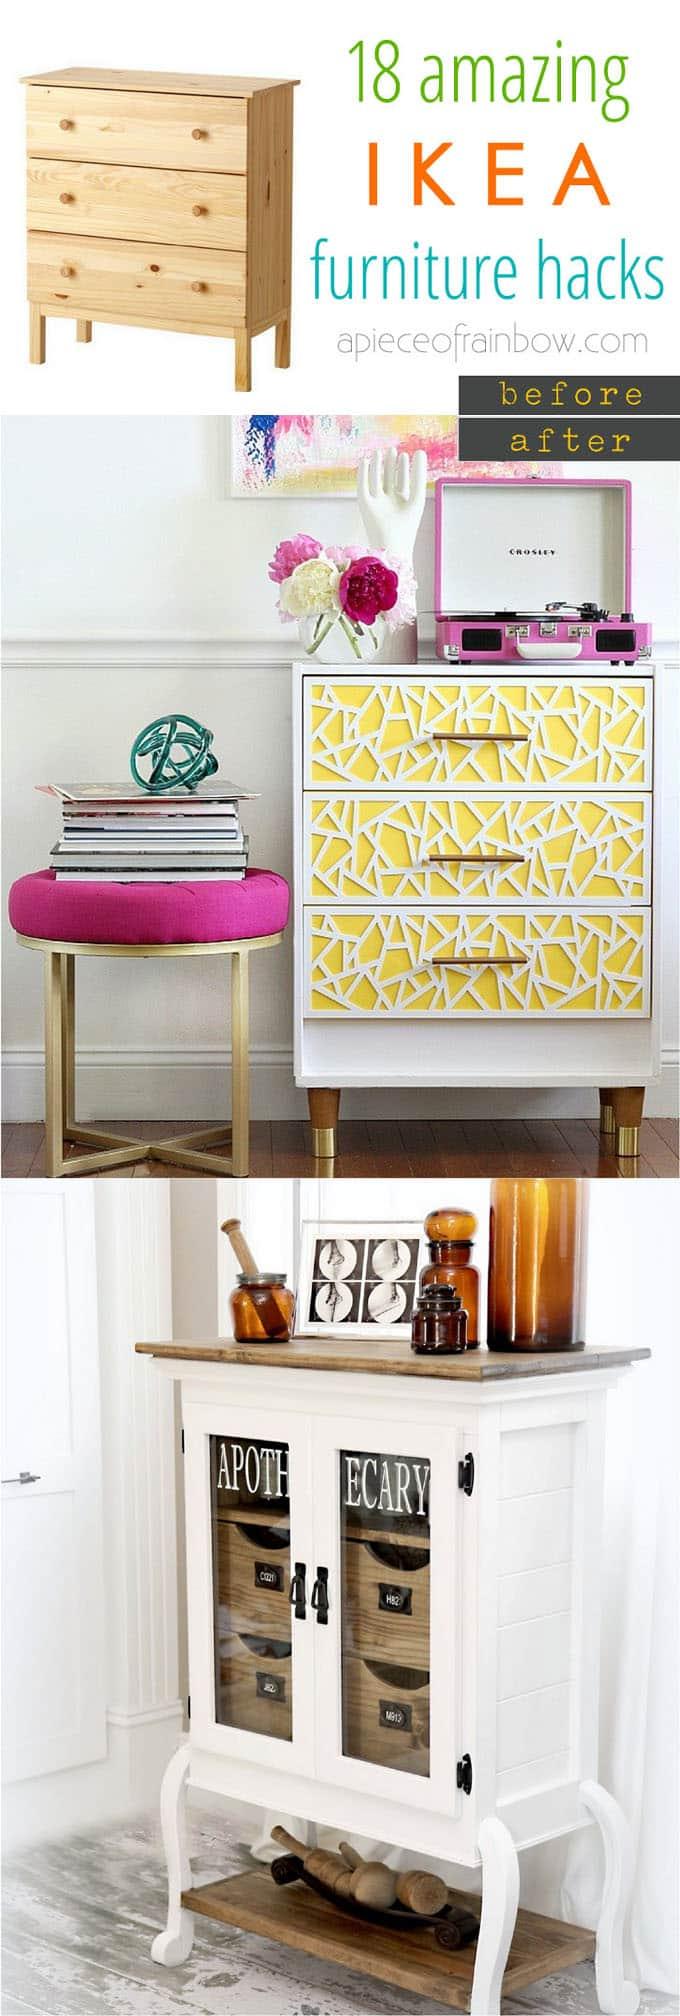 ikea-hacks-custom-furniture-apieceofrainbow-5